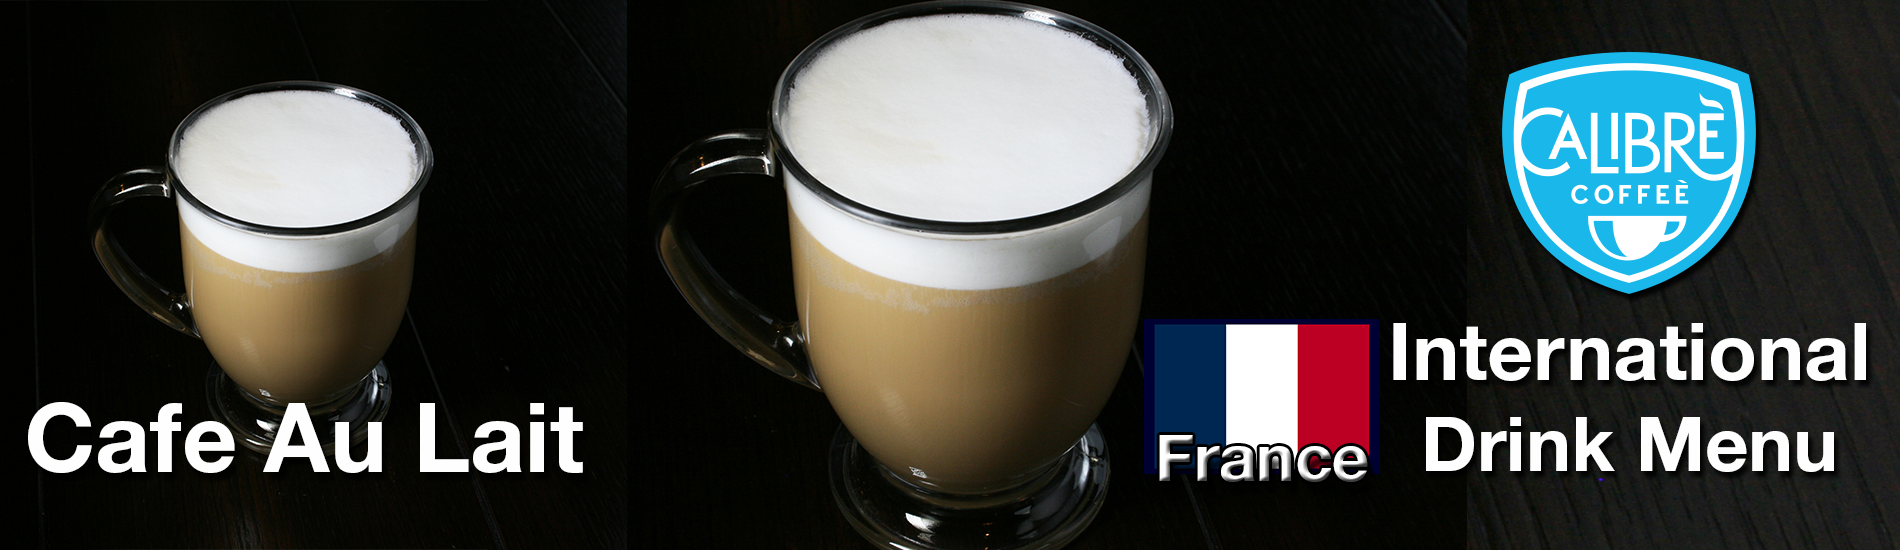 calibre-coffee-slides-international-coffee-Cafe-Au-Lait